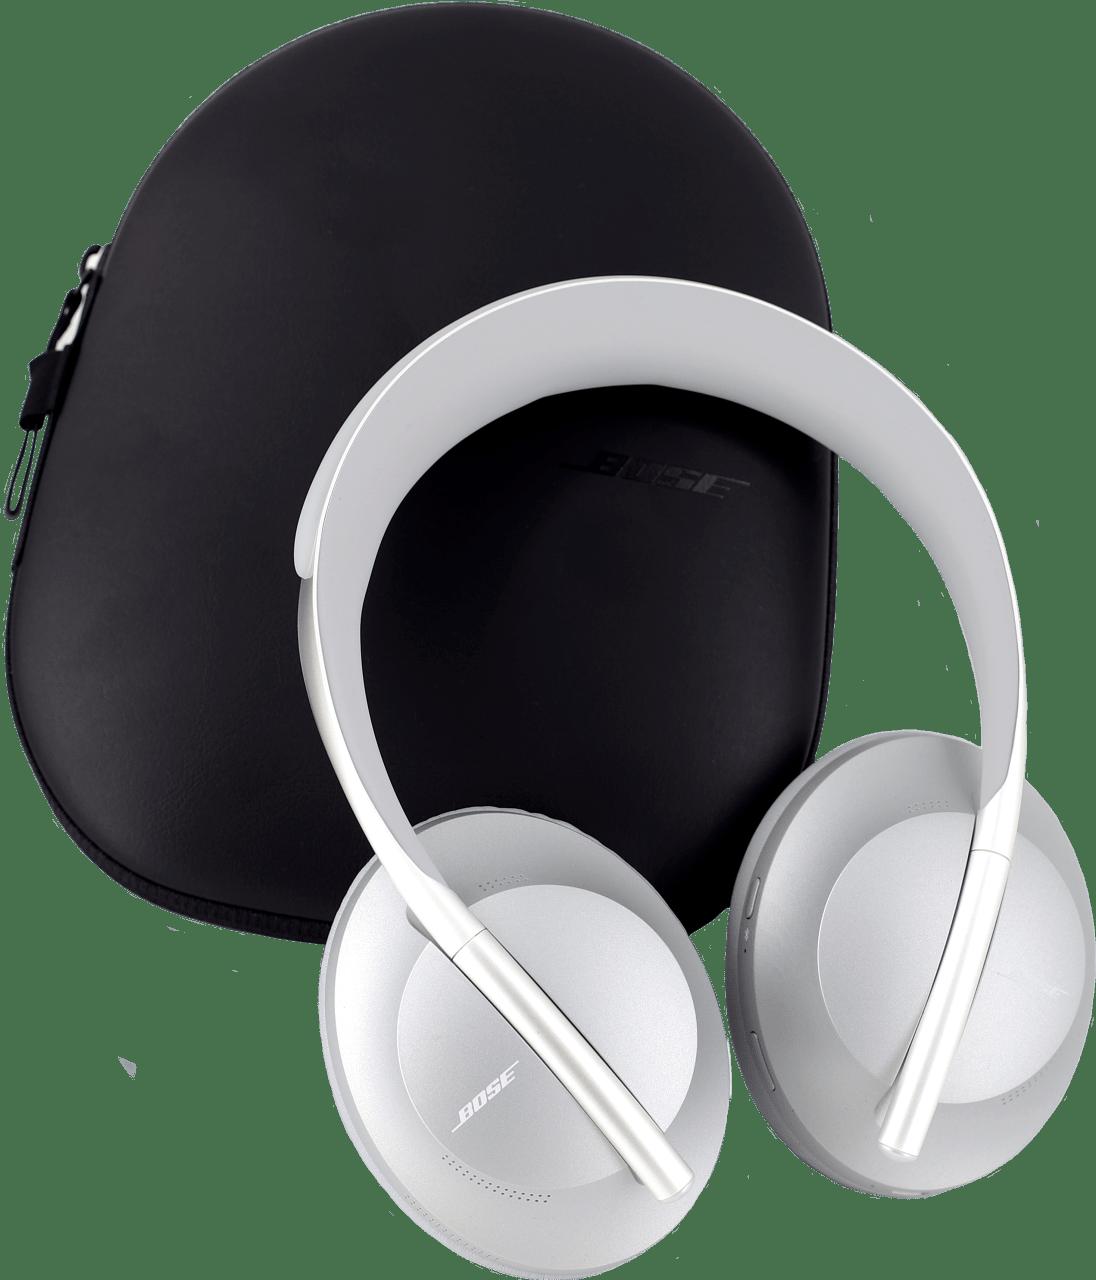 Silver Bose 700 Over-ear Bluetooth Headphones.3